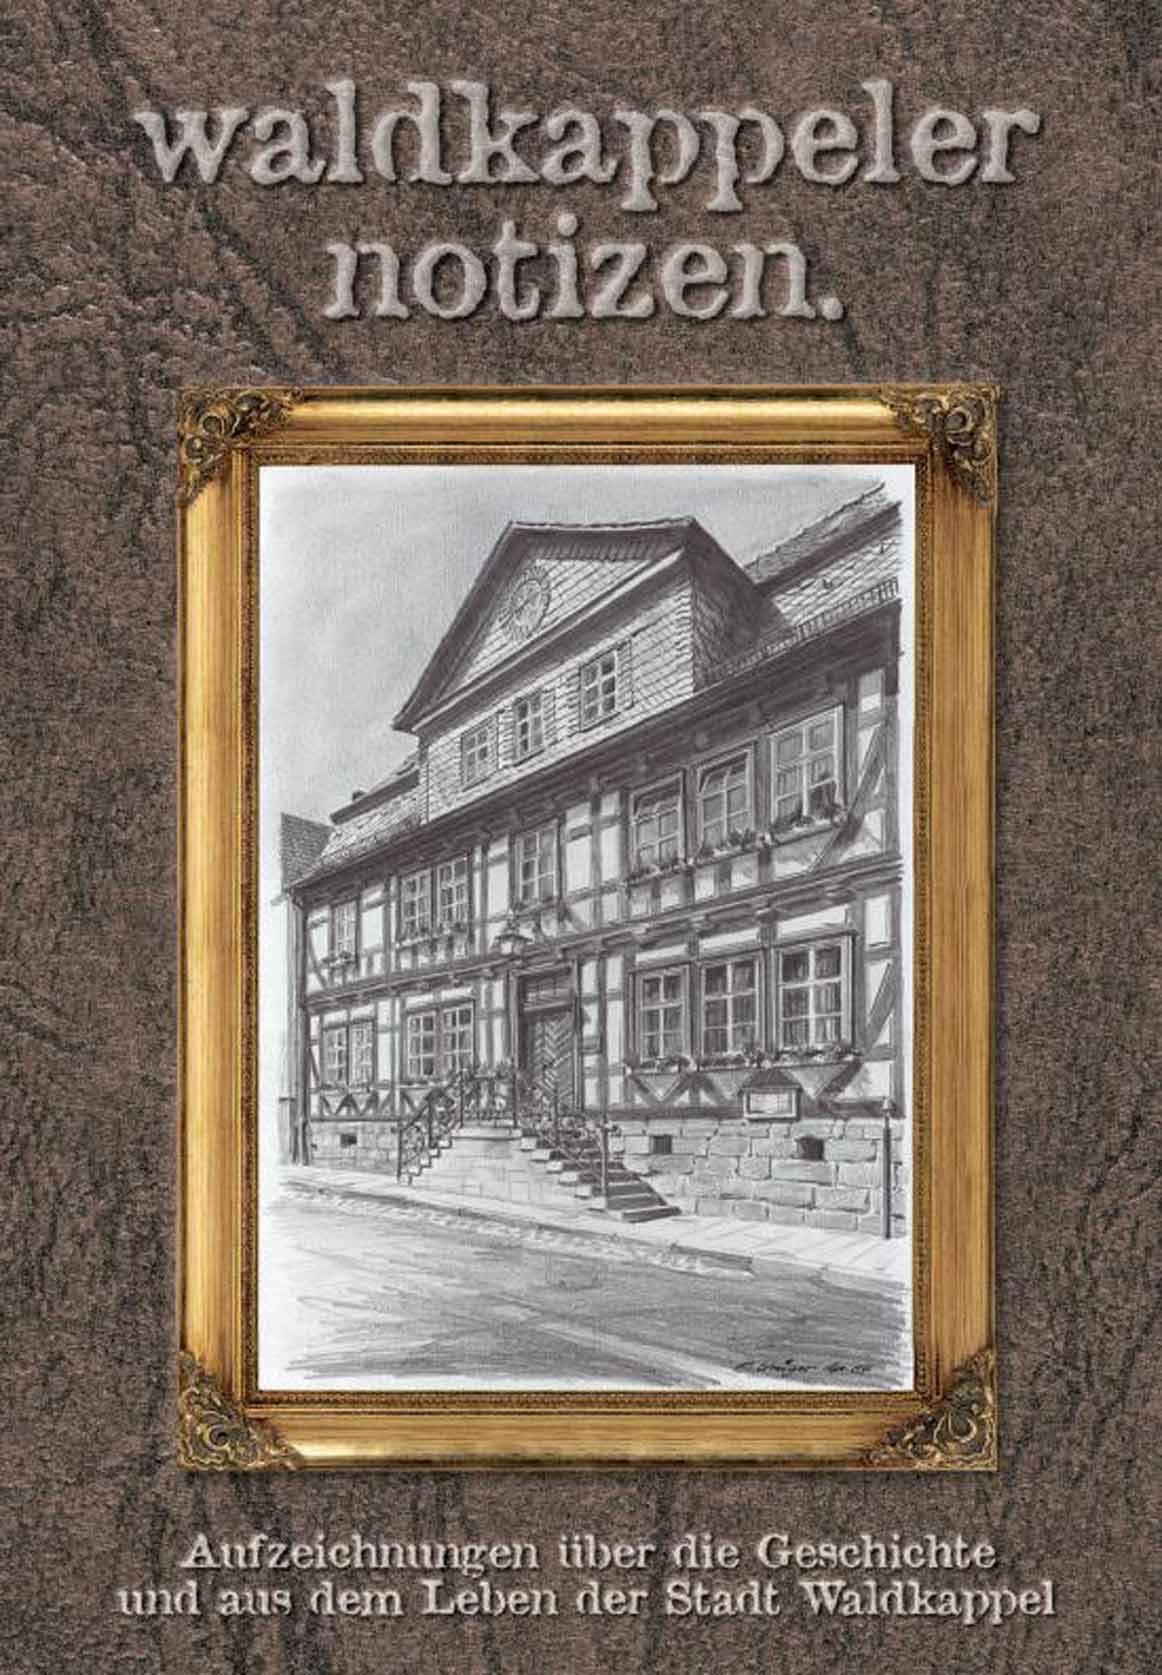 Chronik der Stadt Waldkappel